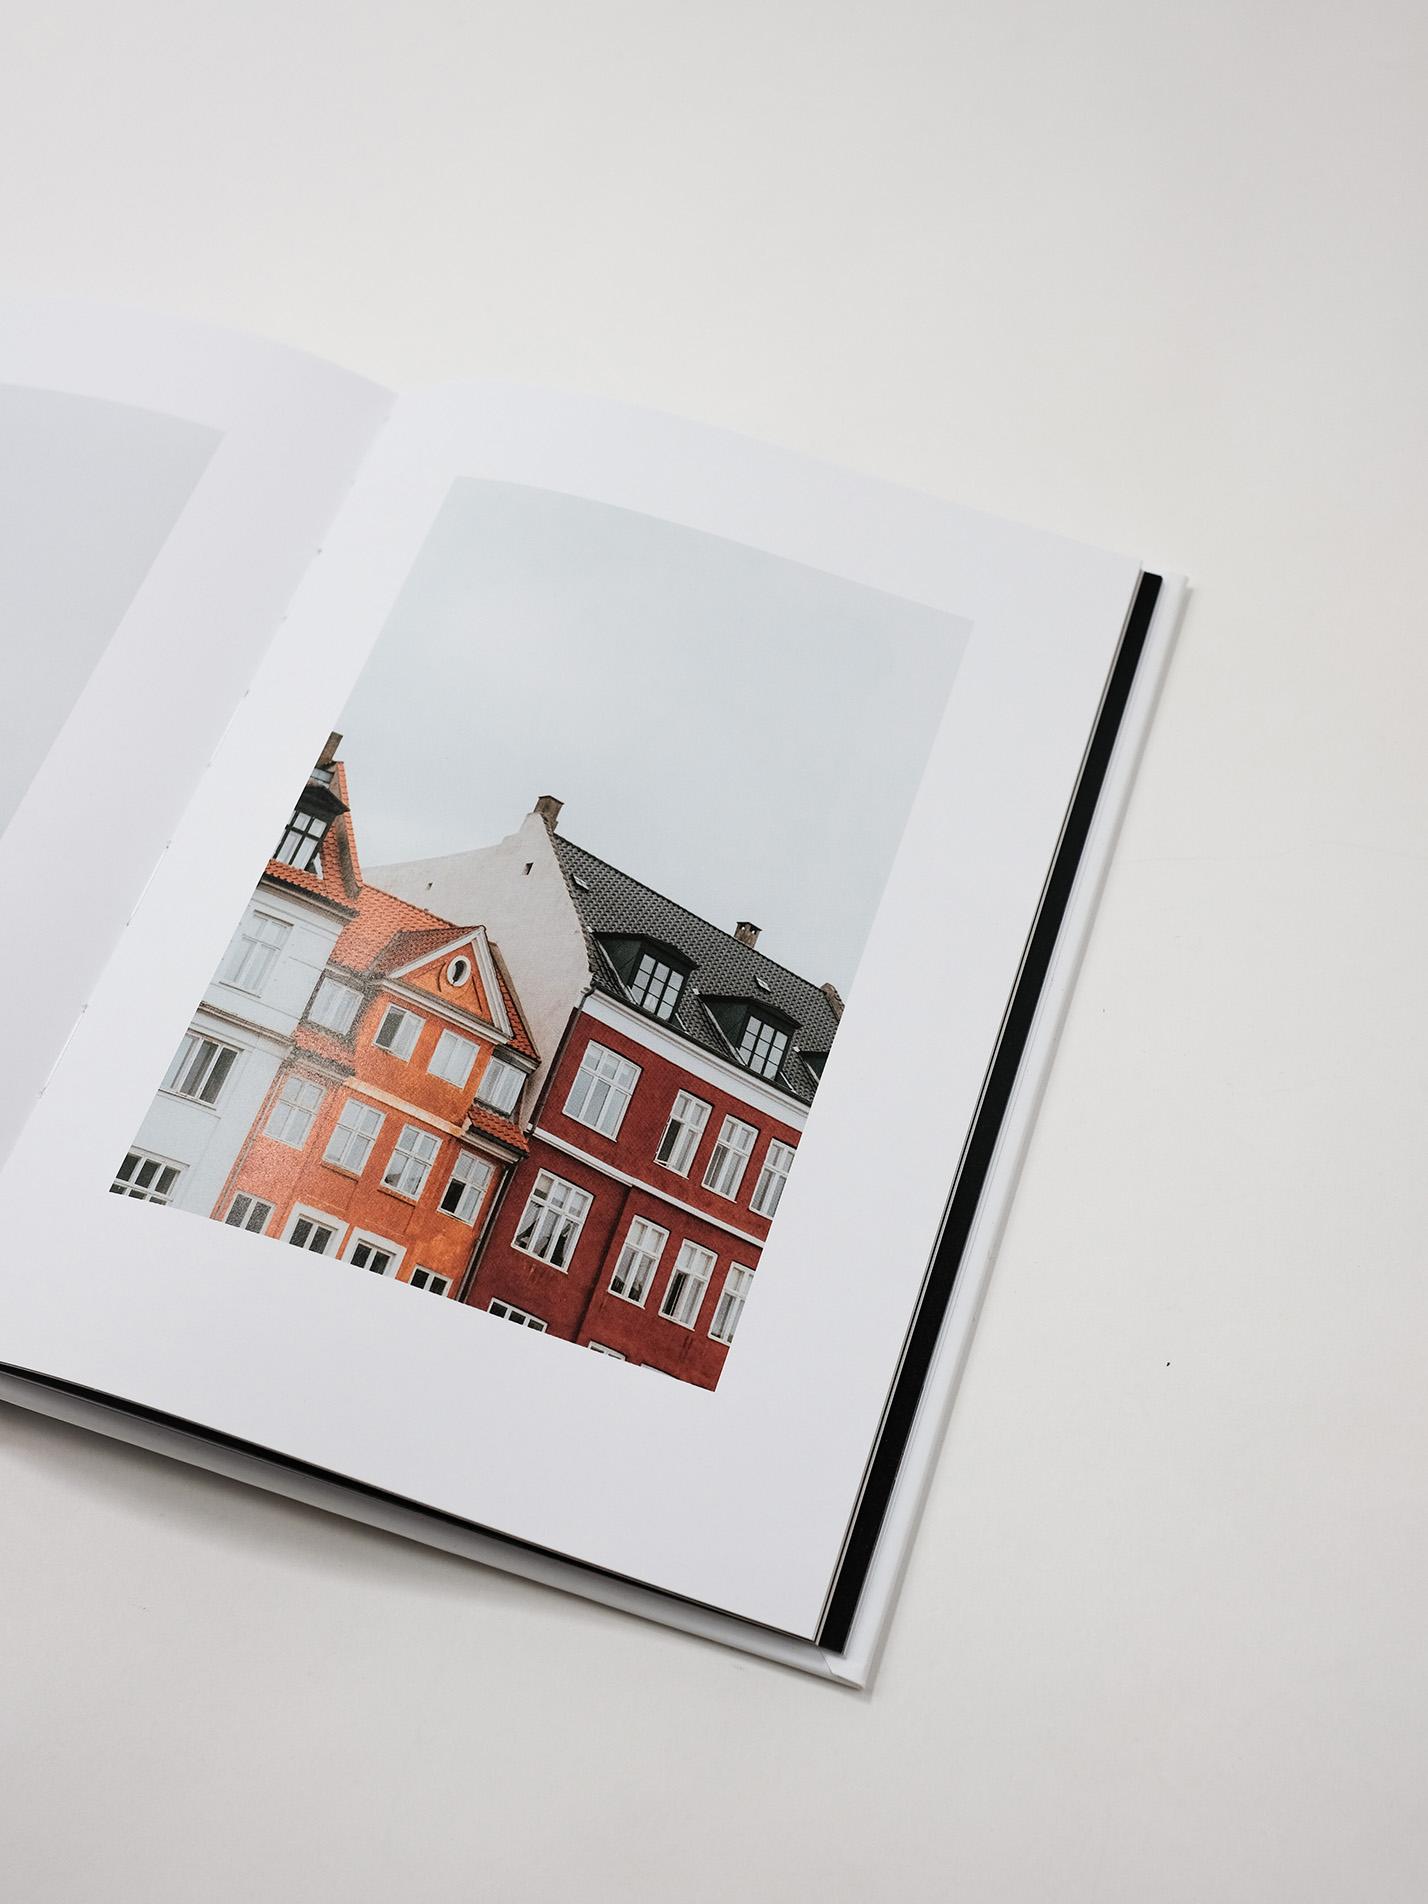 toby-mitchell_weekender_copenhagen_malmo_photobooks_daniel-zachrisson6.jpg